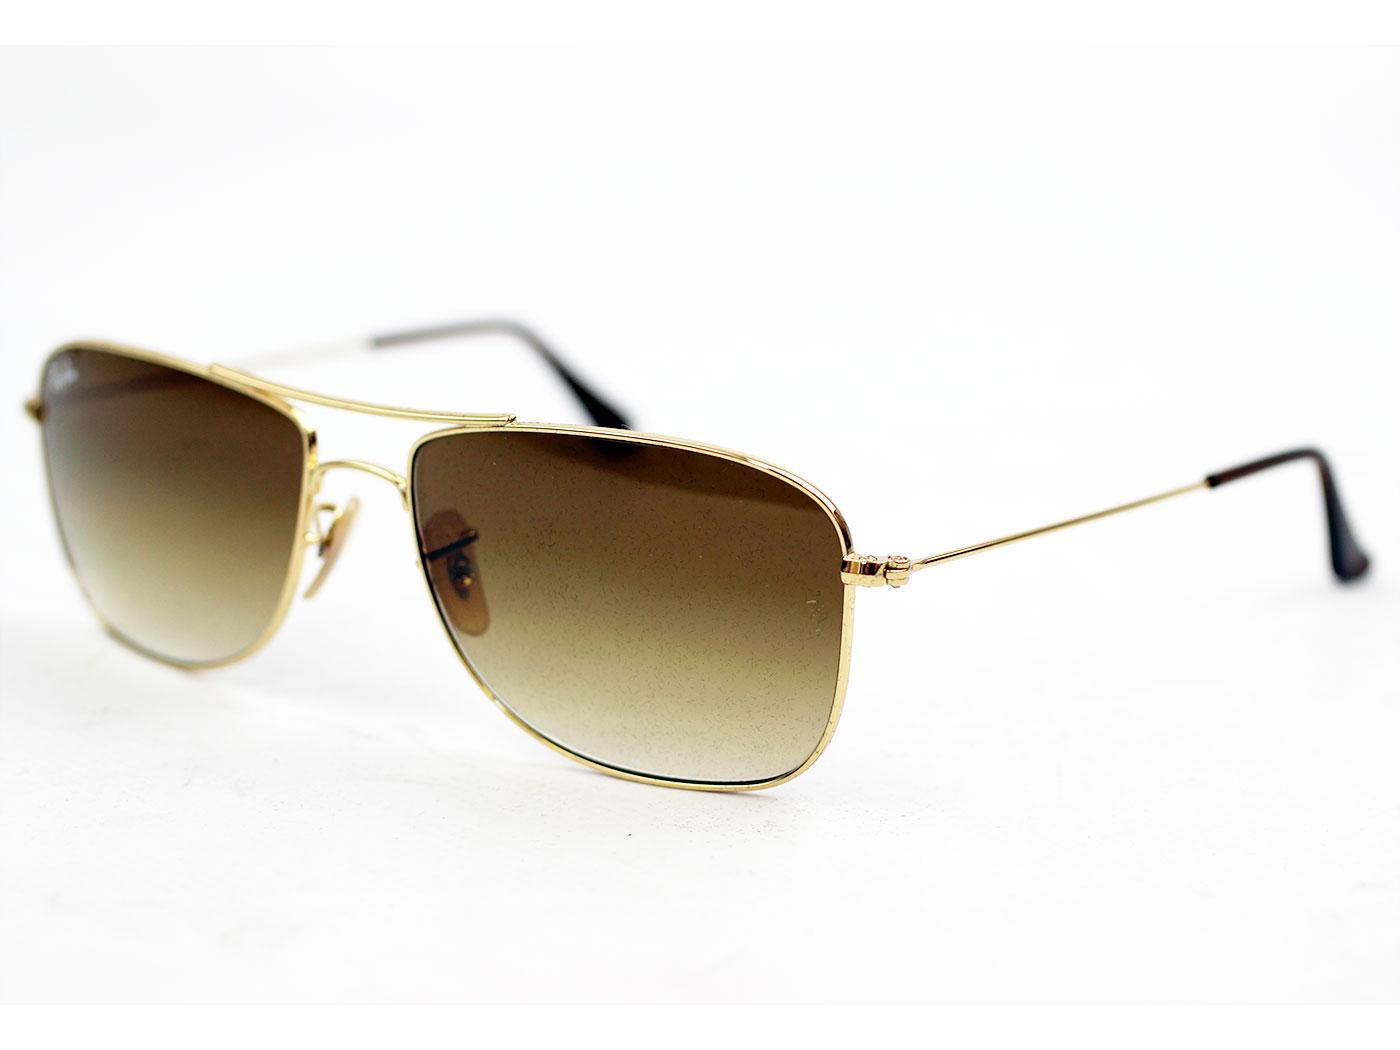 70s ray ban sunglasses